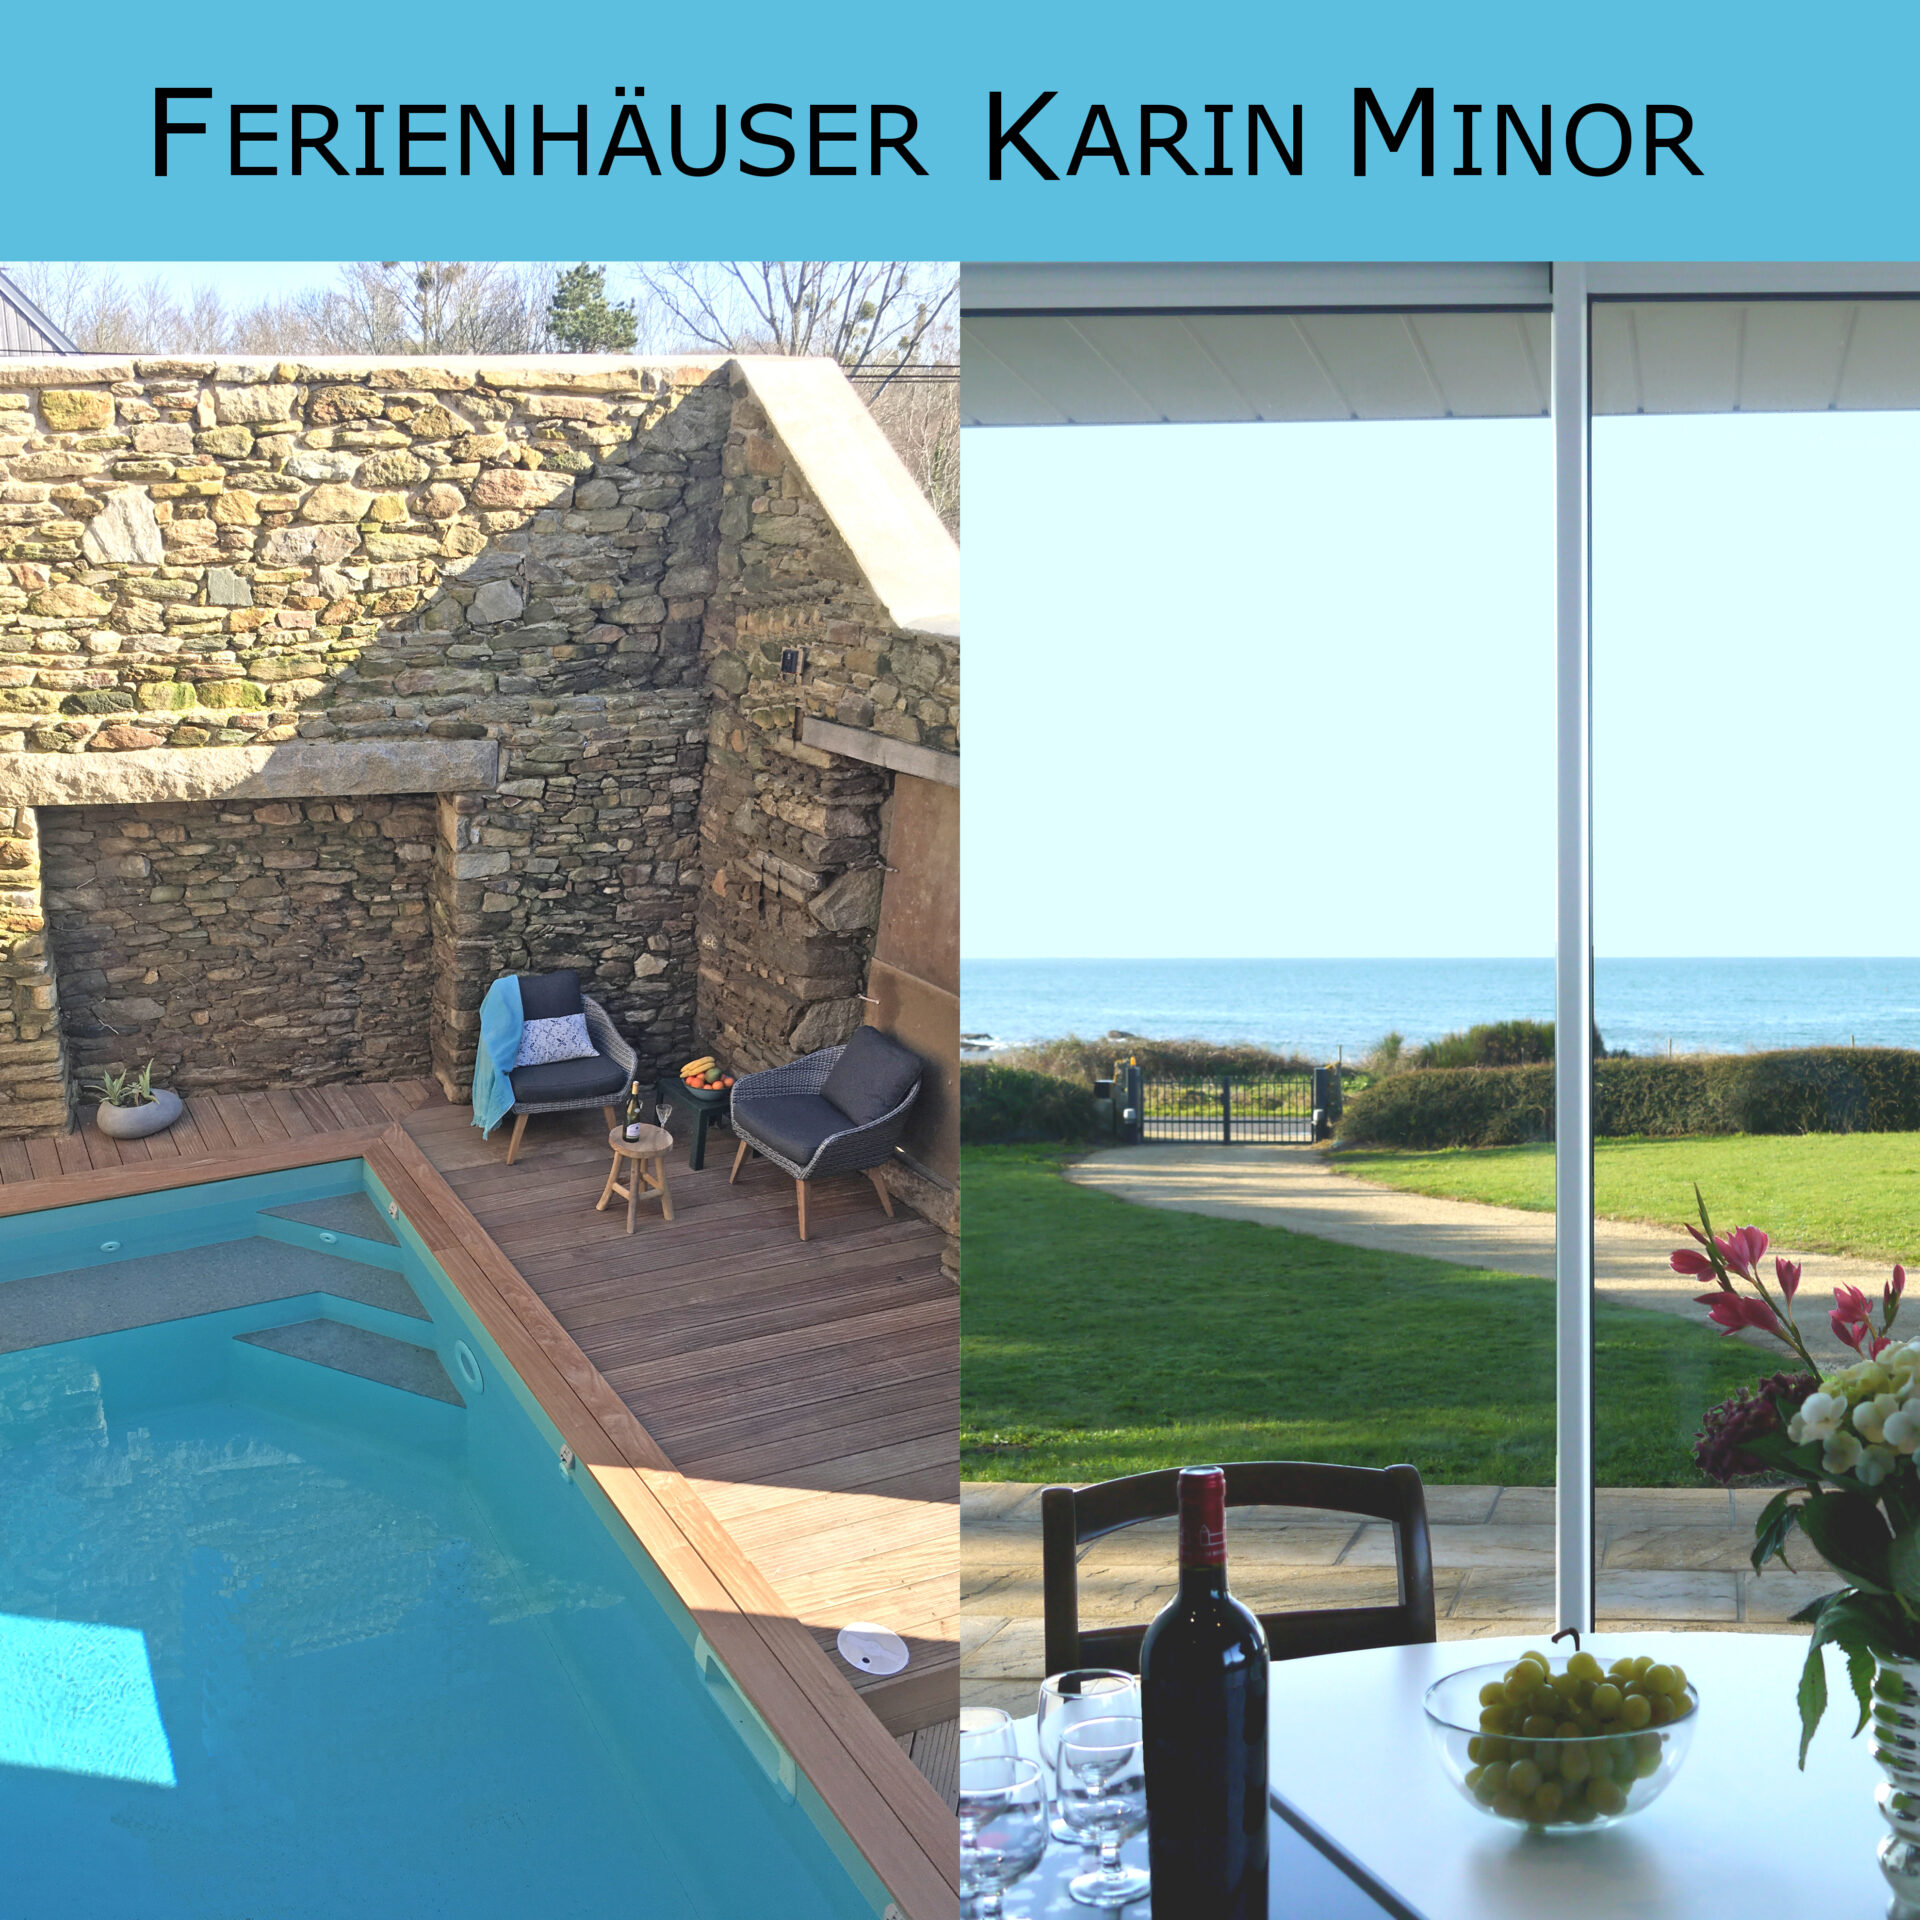 Maisons de vacances Agence Karin Minor